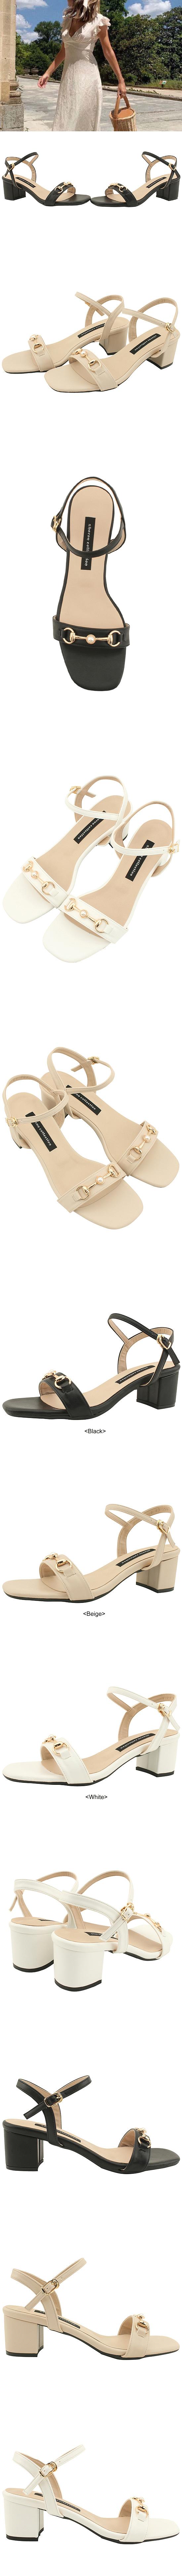 Metal Chain Strap Middle Heel Sandals Black